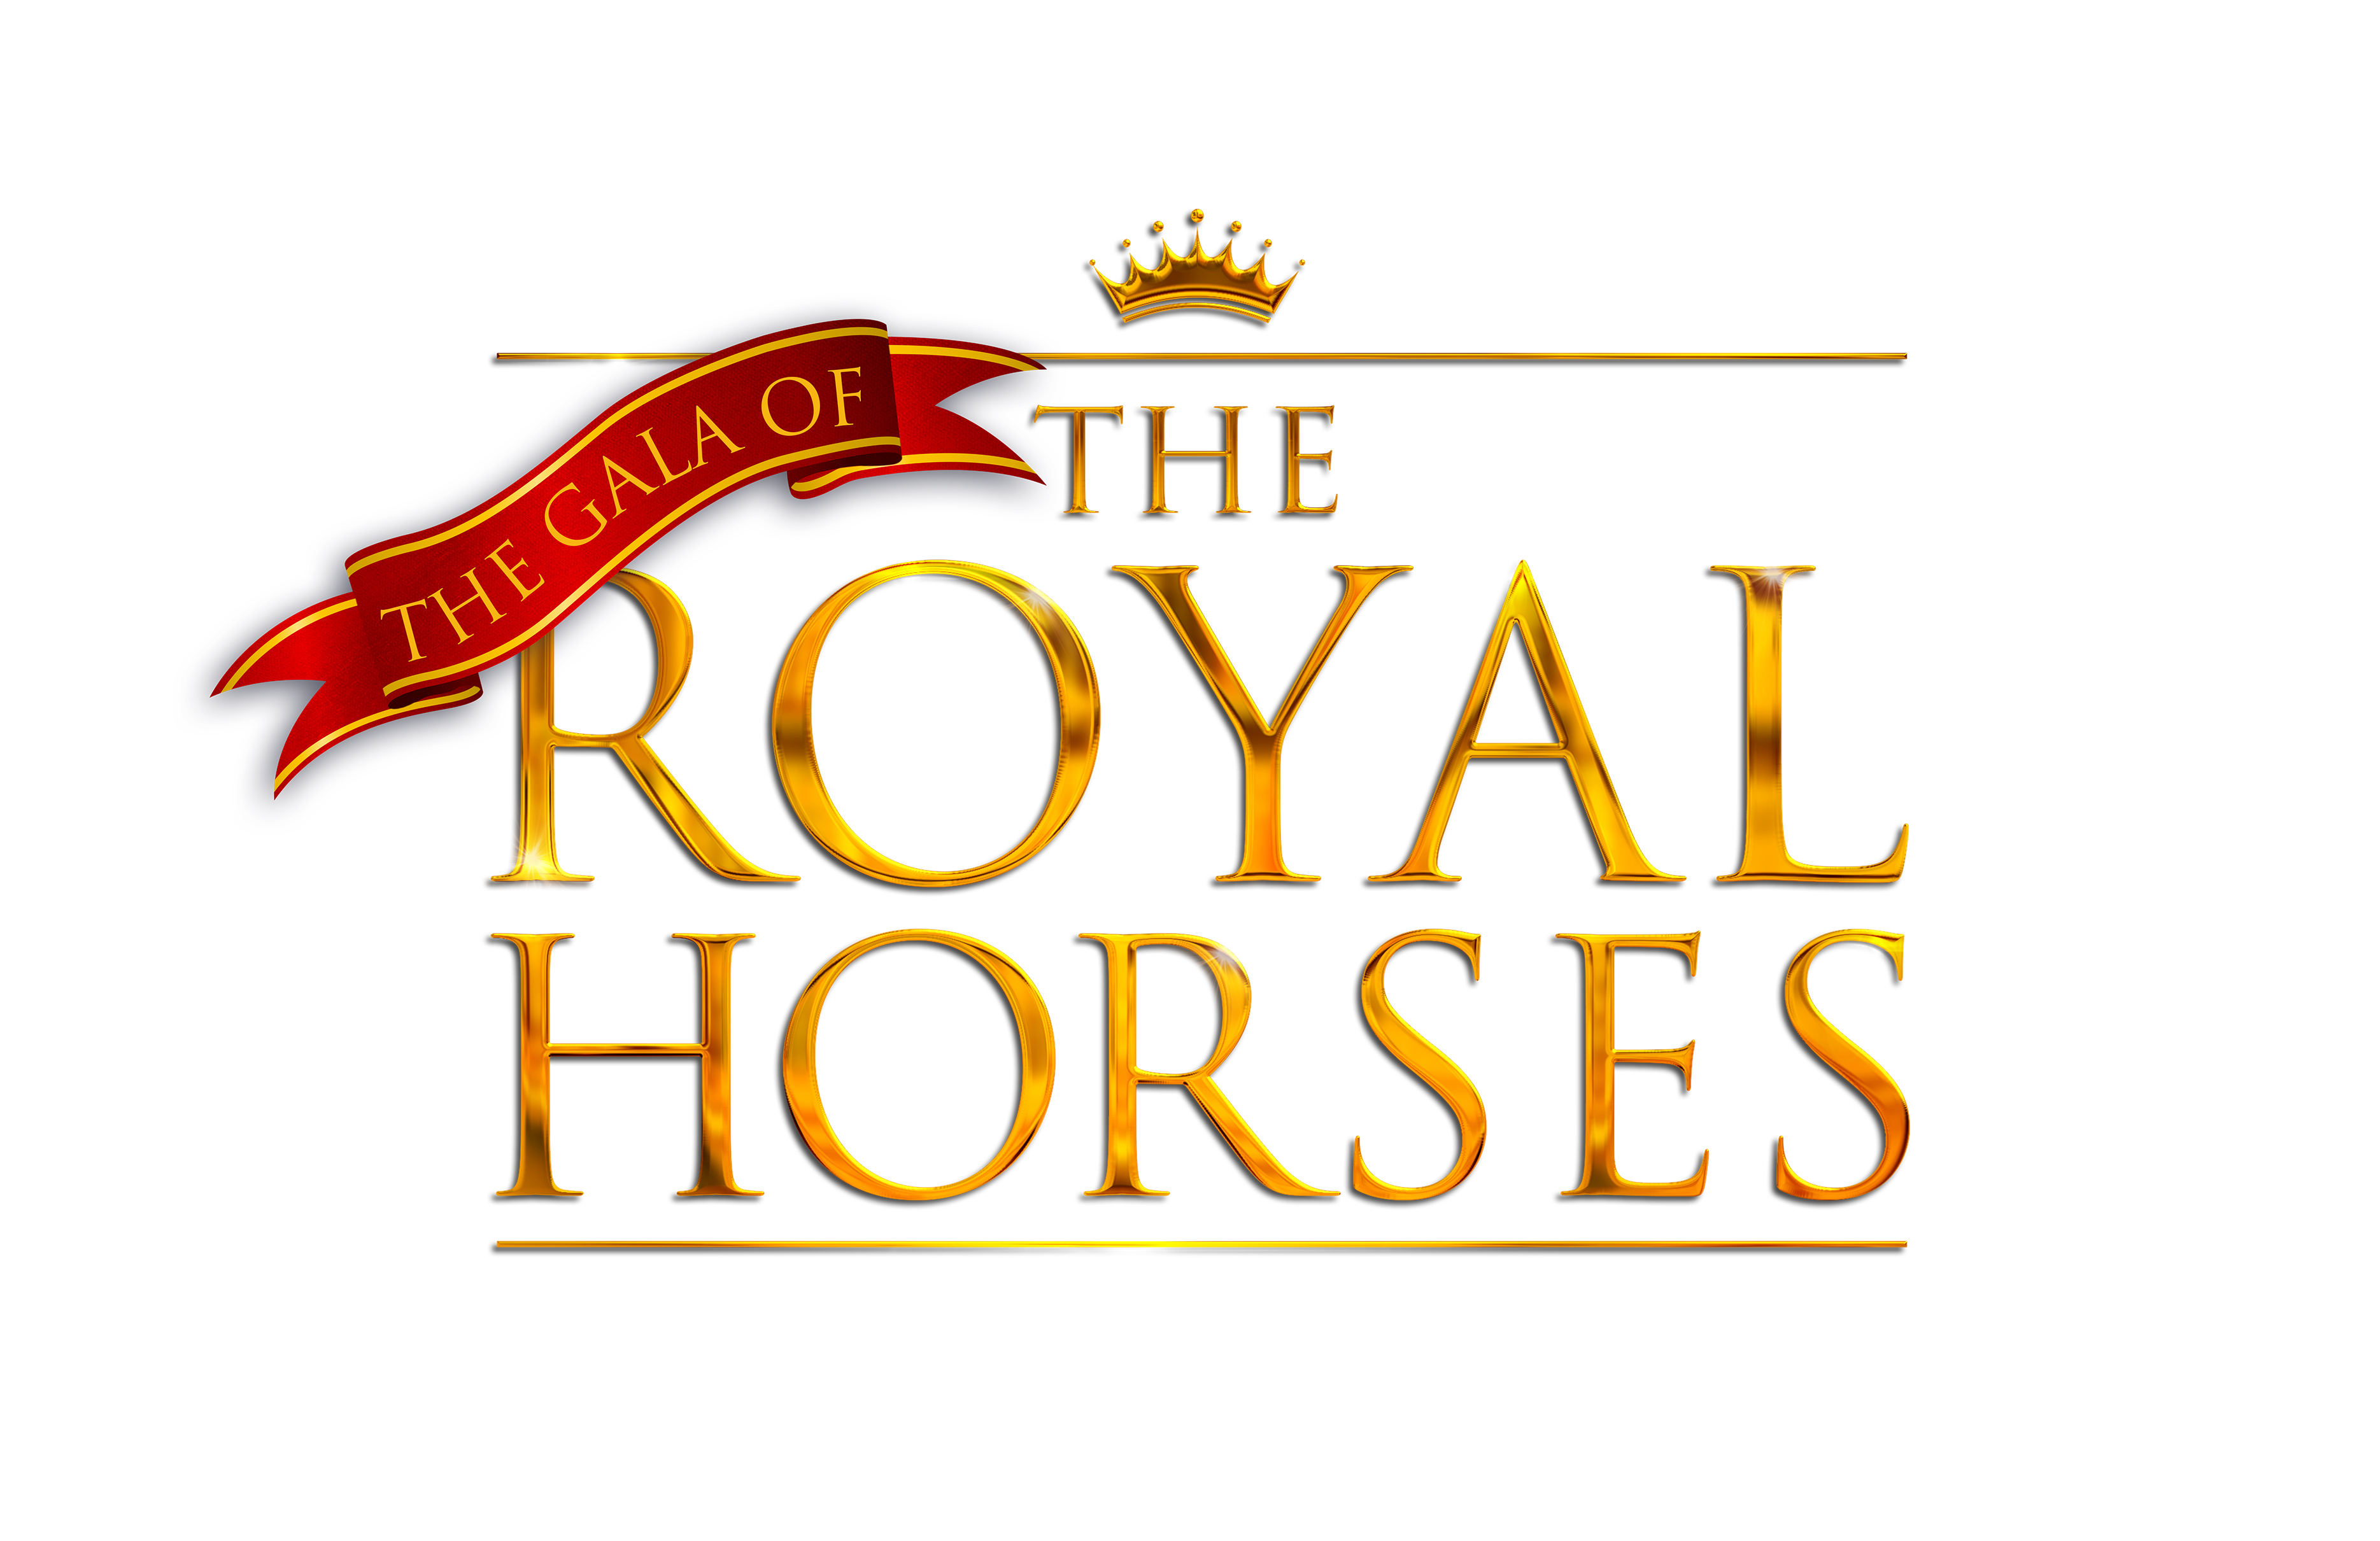 The Gala of the Royal Horses logo in white hi res 6.11.14.jpg